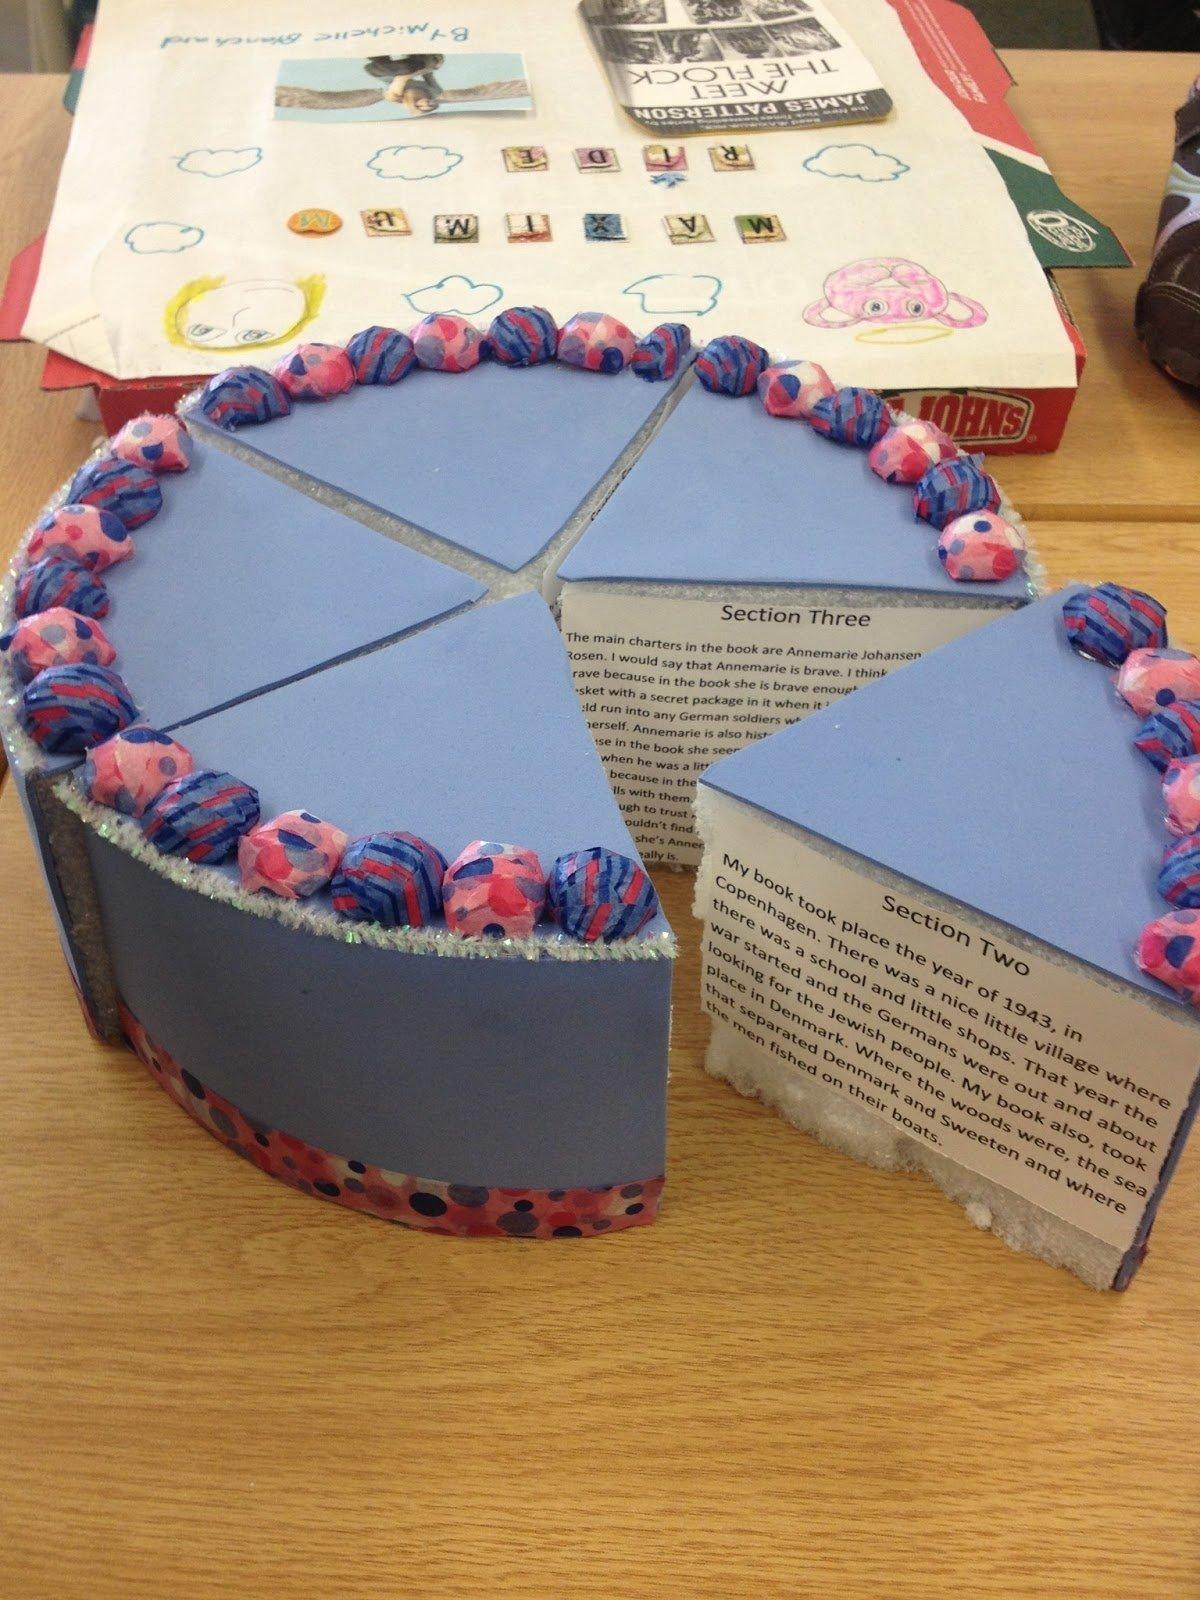 10 Elegant Middle School Book Report Ideas a tasty reading project mrs beatties classroom 5 2021